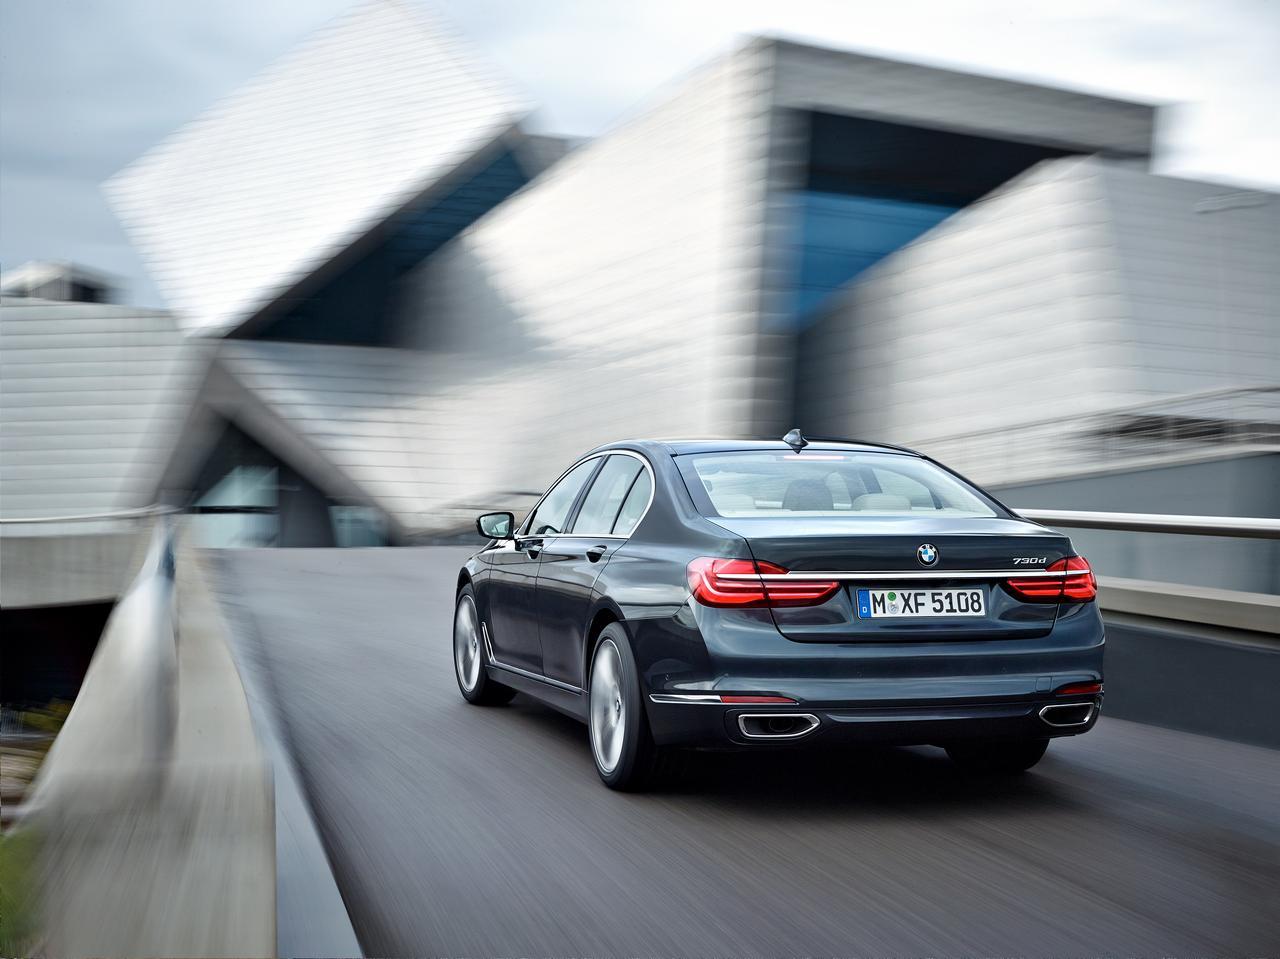 BMW-Serie-7-730d-prezzo-price-0-100_4